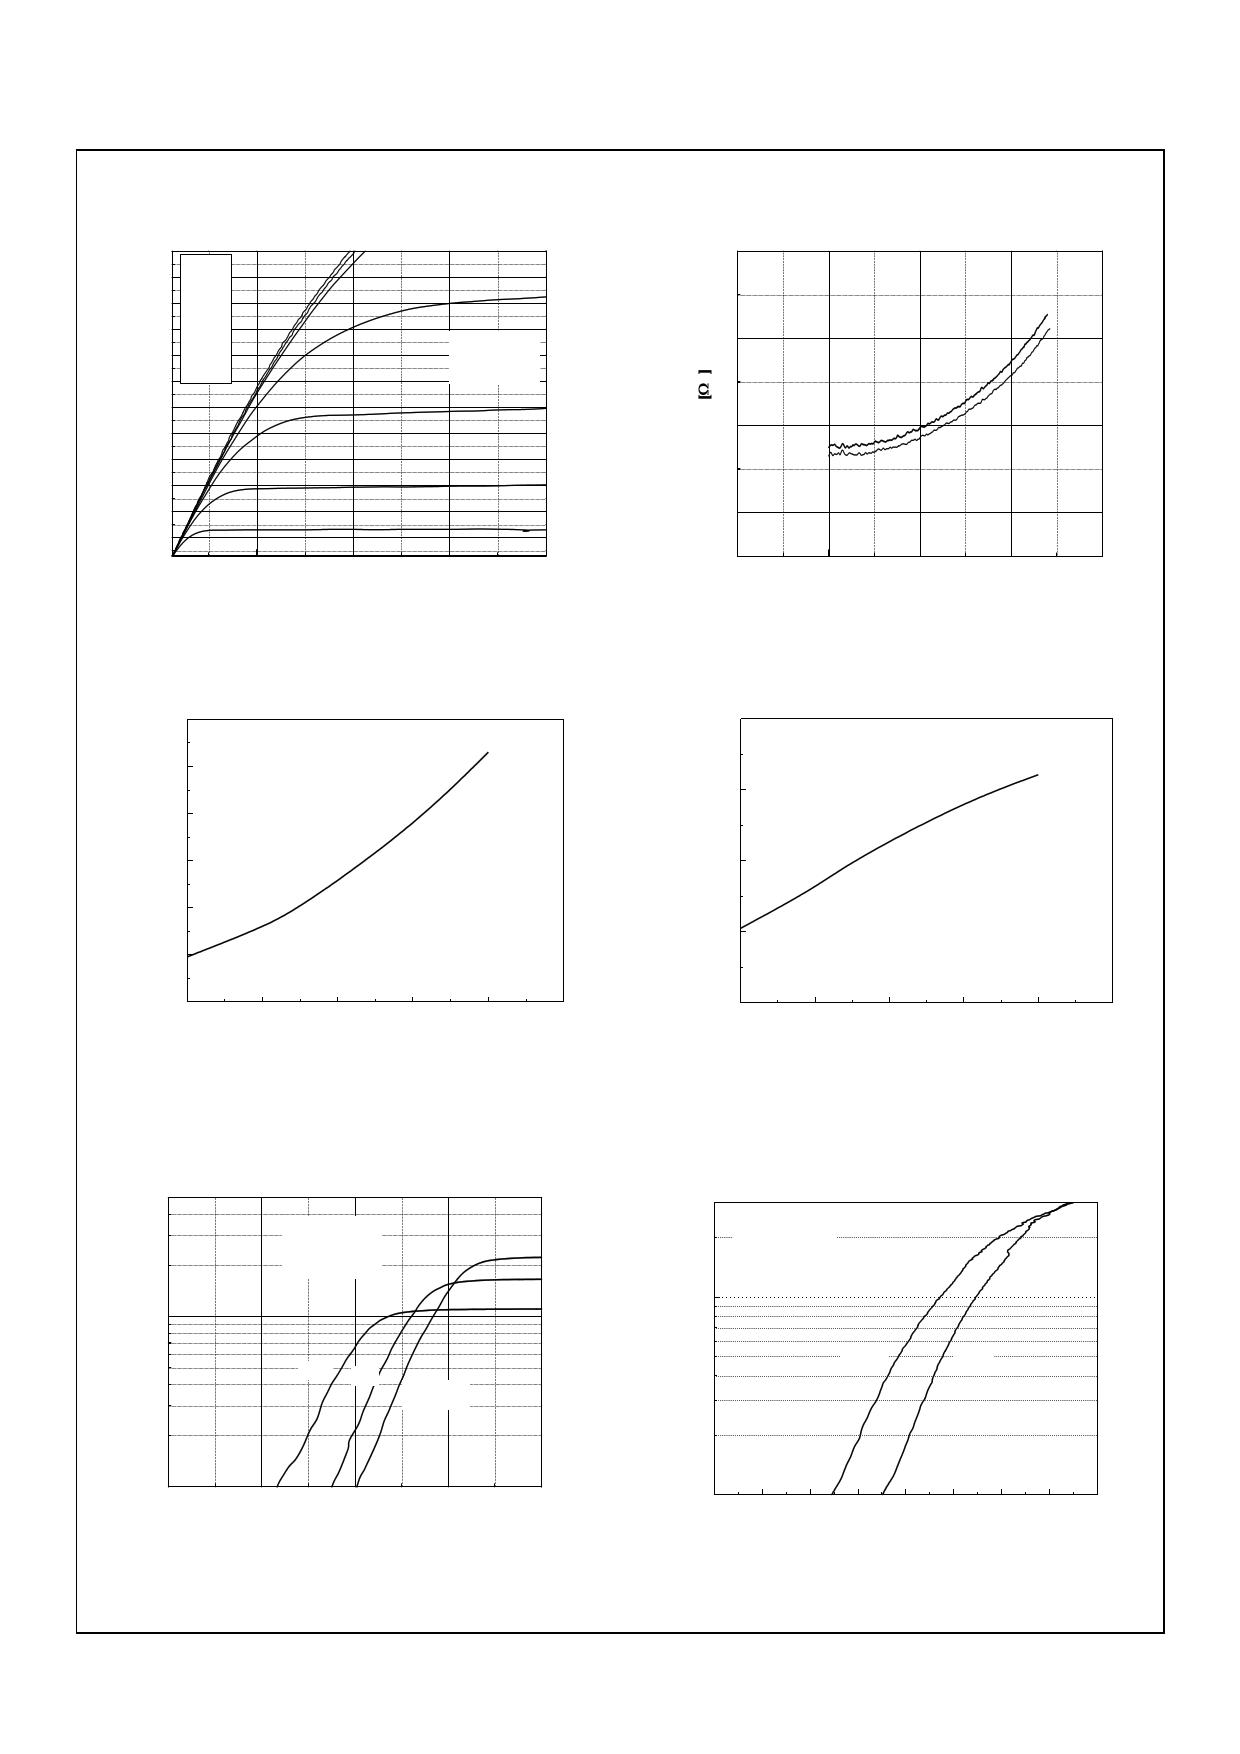 MDP12N50F pdf, ピン配列